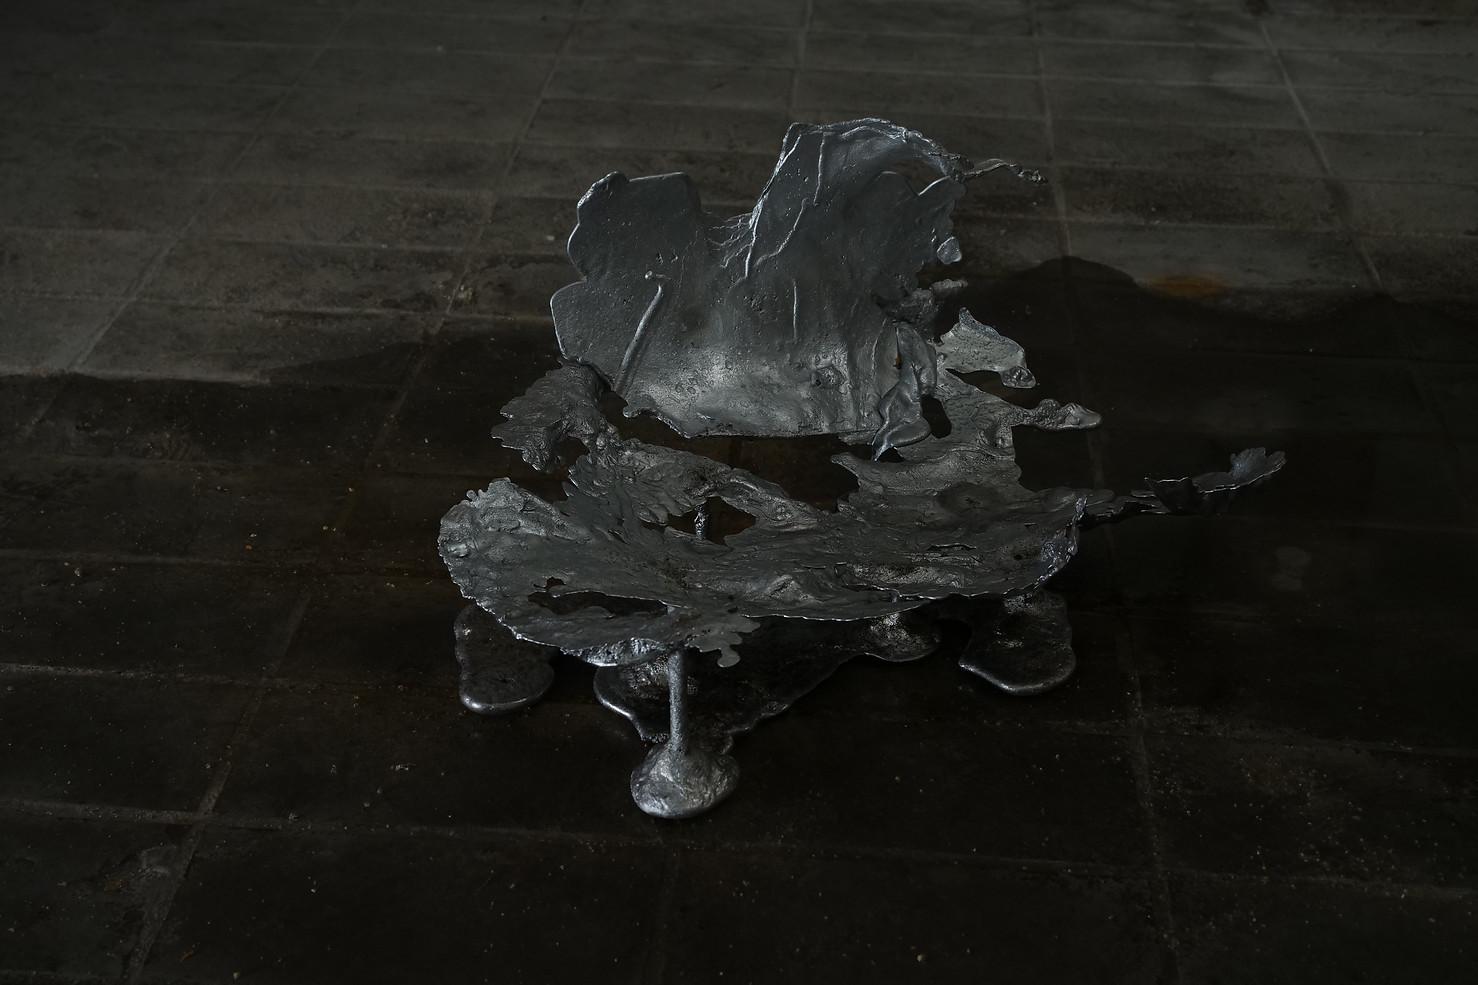 Costado-bandeja, Scrap aluminium and water from a ceiling leak, 2020